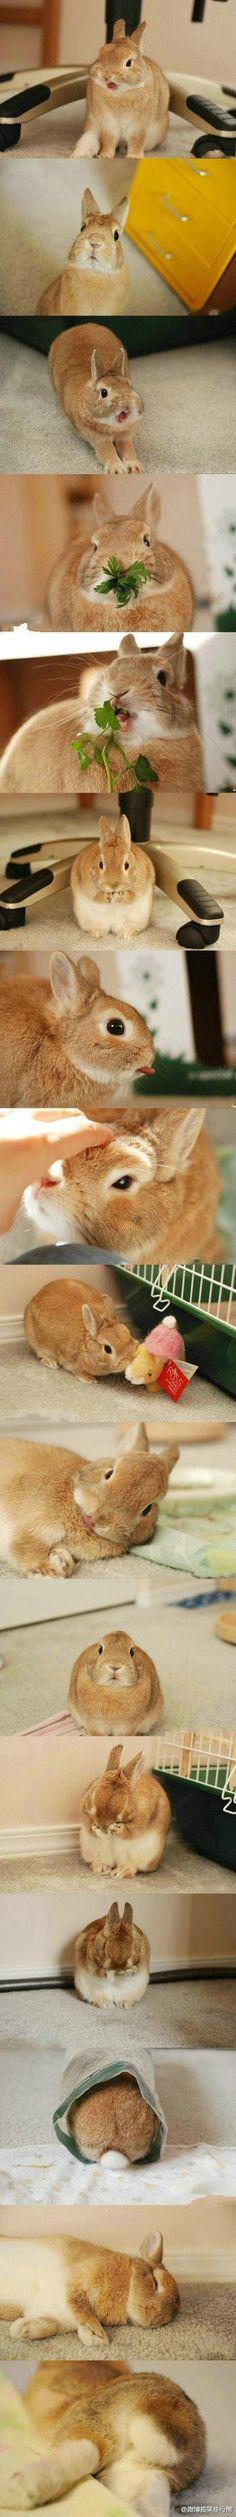 Rabbit, Bunny, Bunnies, Hare, Lapin, Conejo, кролик, Coniglio, Coelho, Kaninchen, 兔, ウサギ,